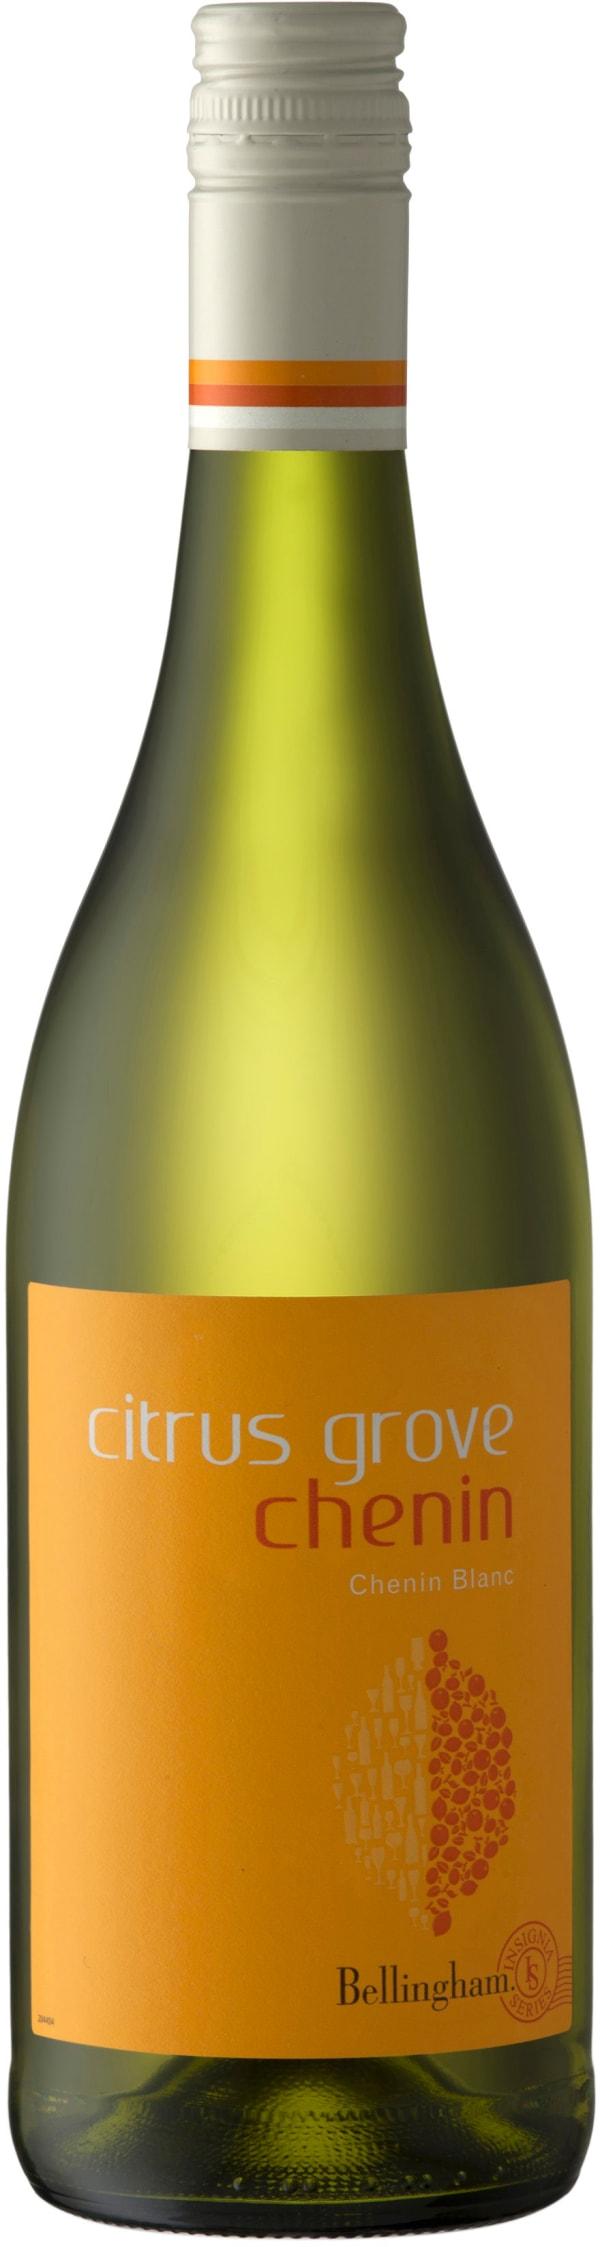 Bellingham Citrus Grove Chenin Blanc 2014